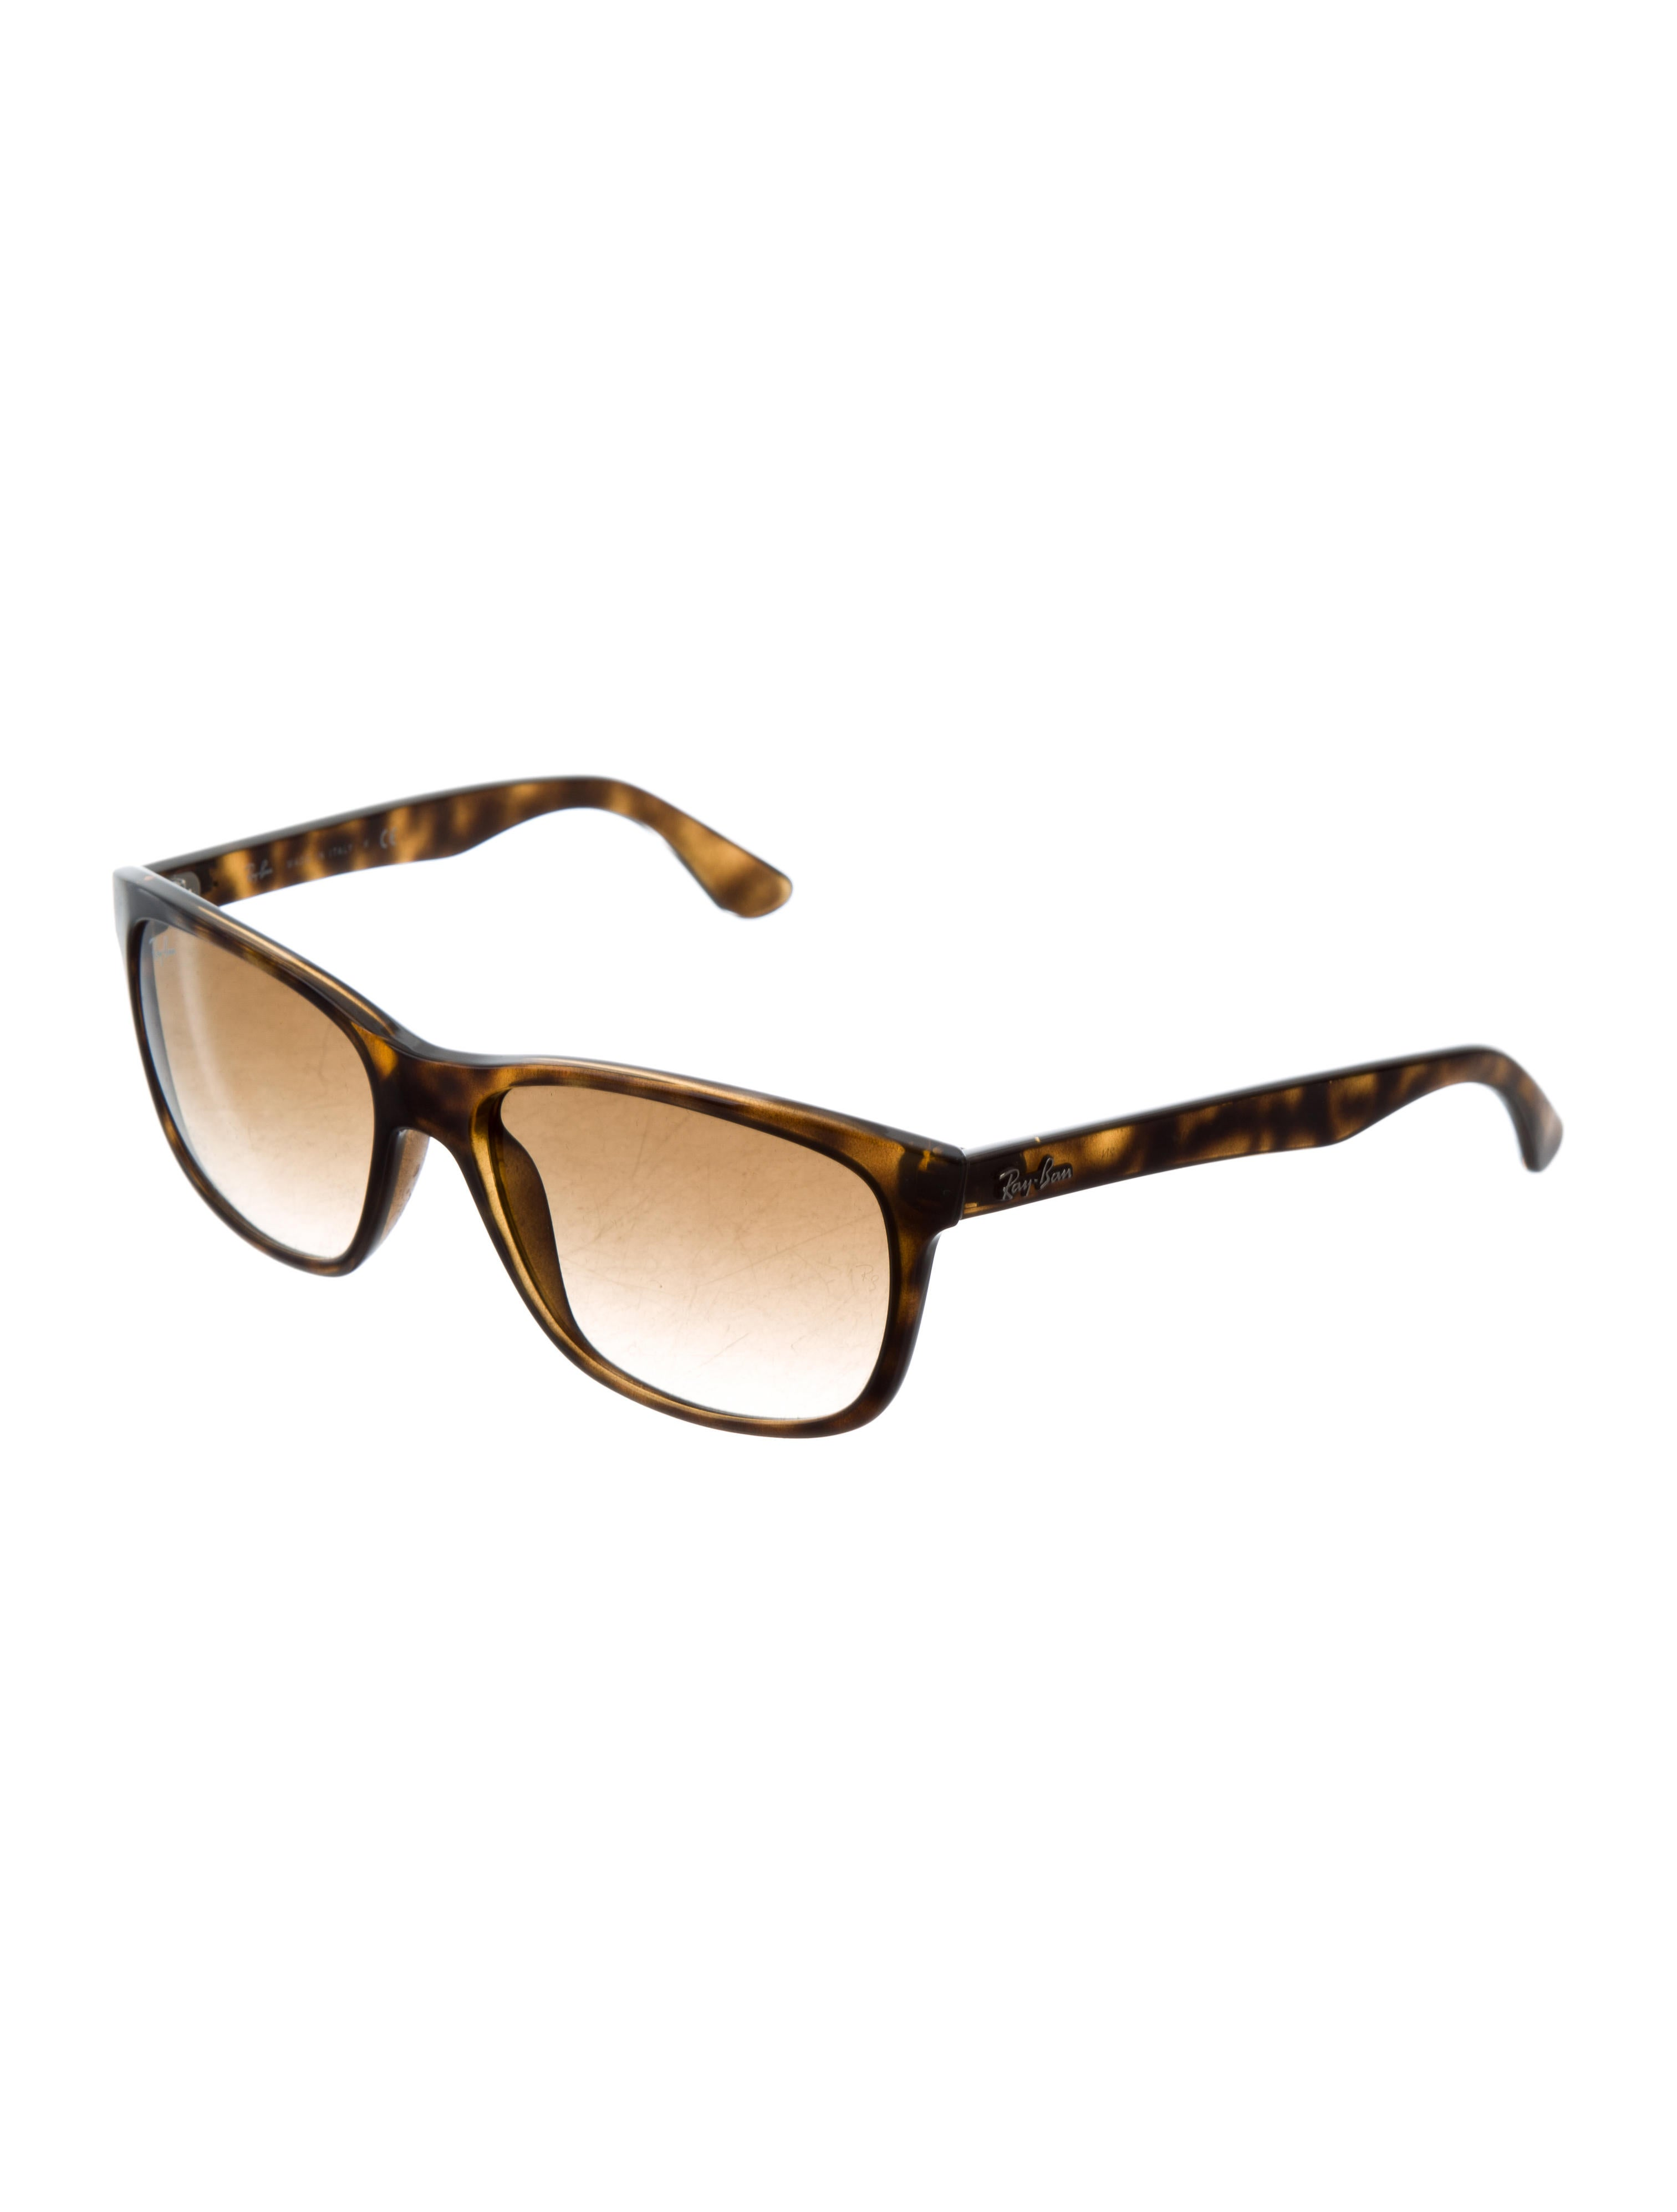 7b849026e1f7 Ray-ban Rb4181 Sunglasses